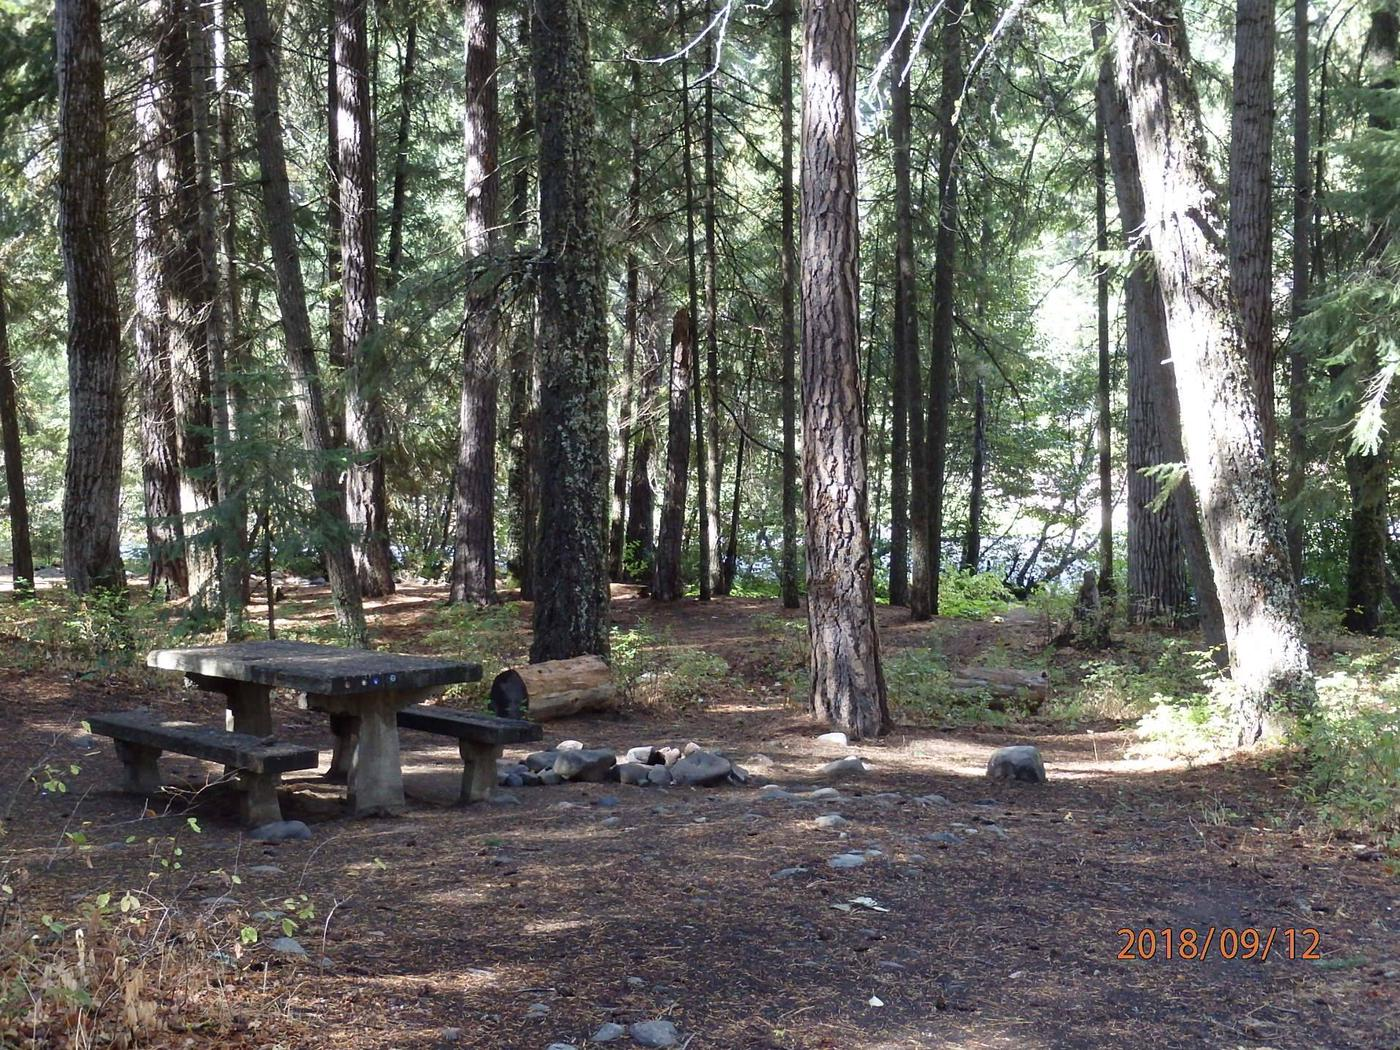 Sawmill FlatNice site near the Naches River